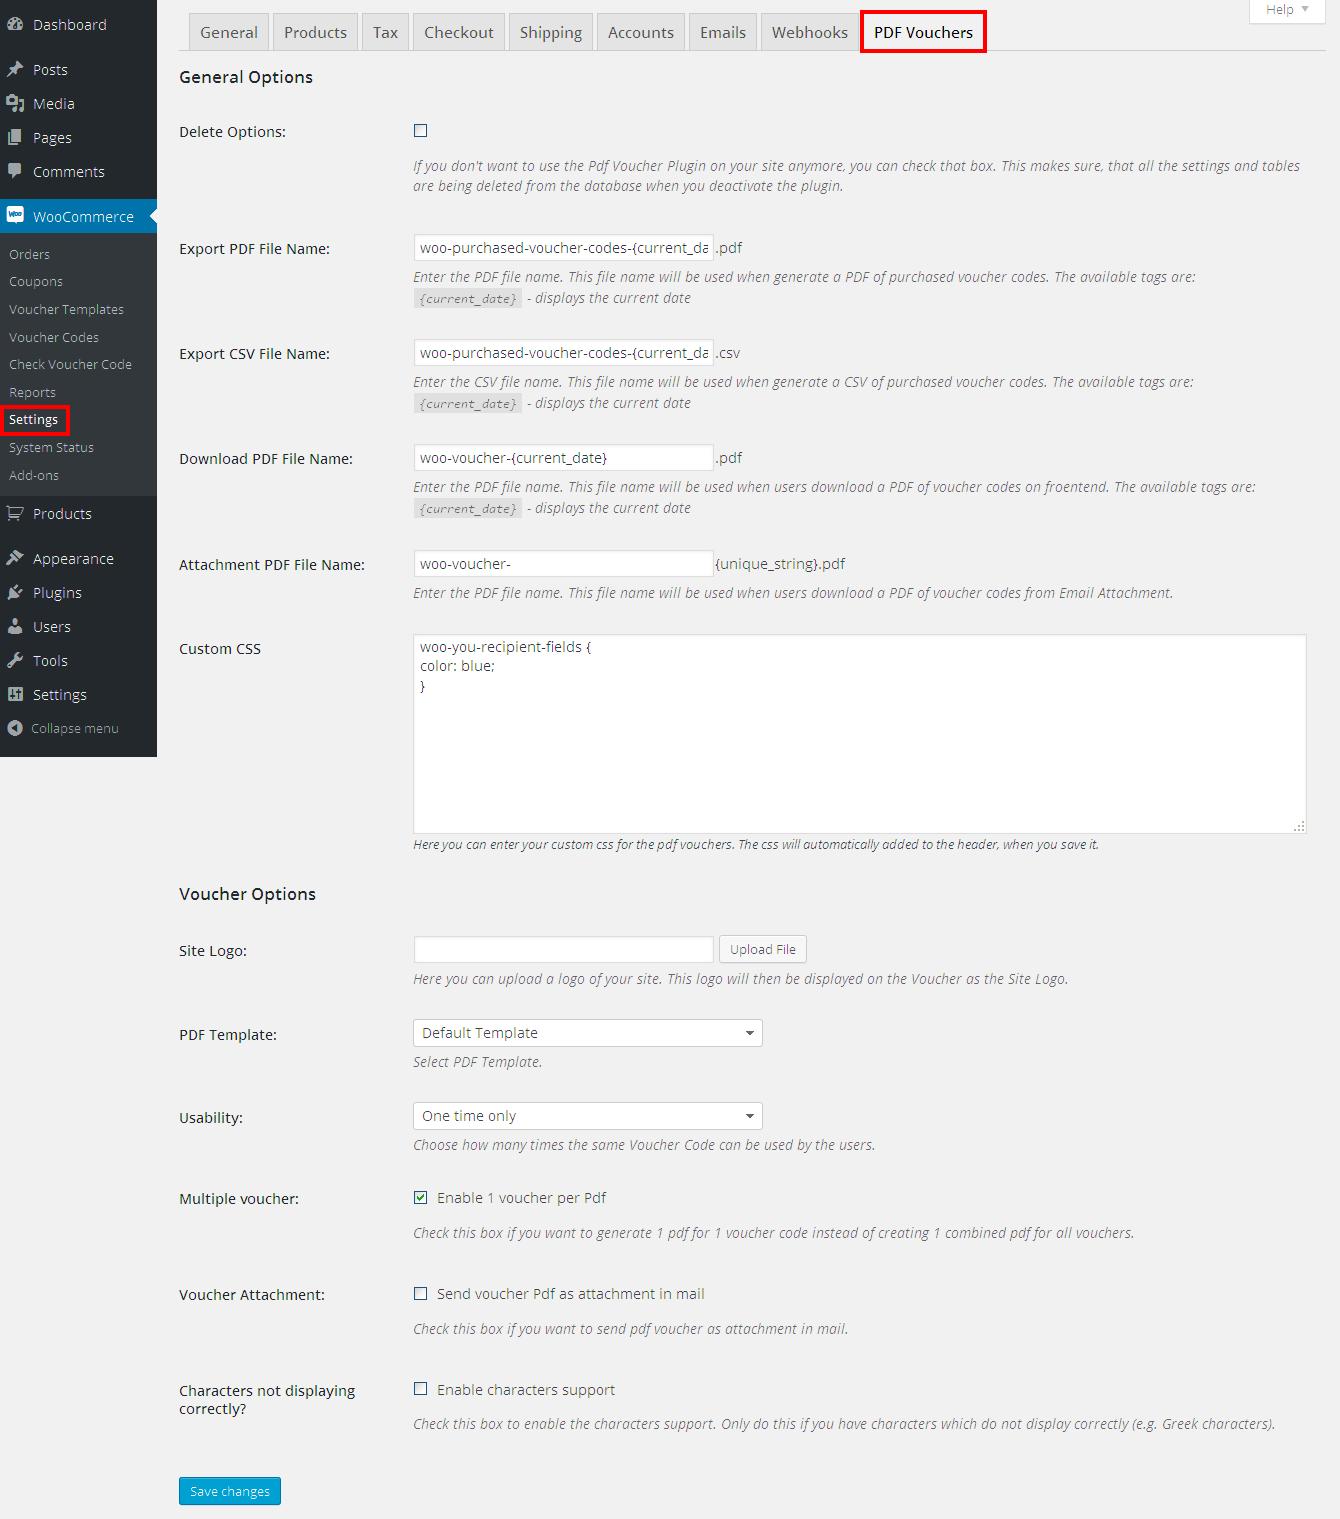 Woo merce PDF Vouchers WordPress Plugin by wpweb